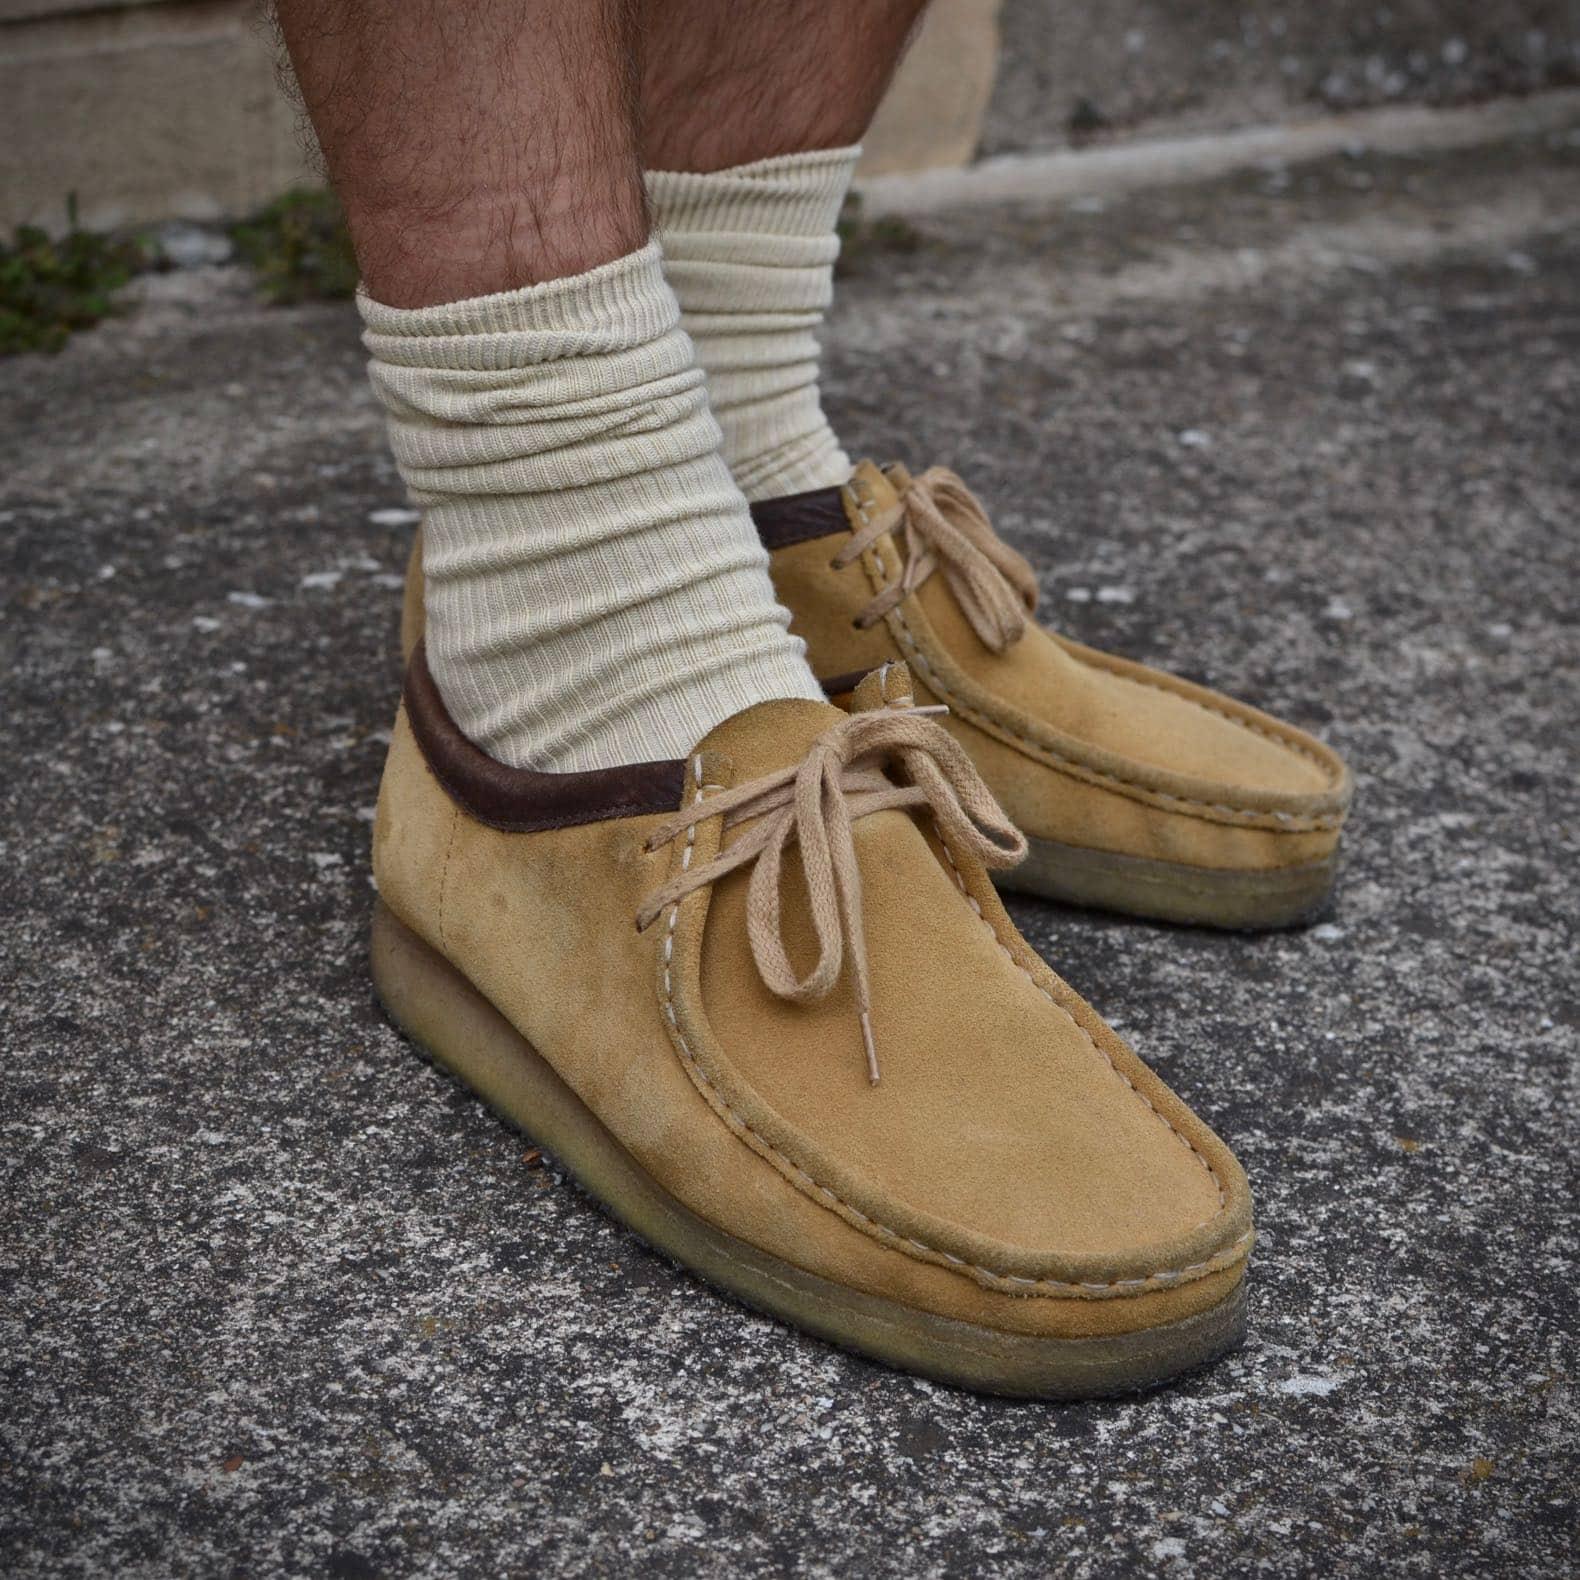 clarks wallabee beige chaussettes uniqlo